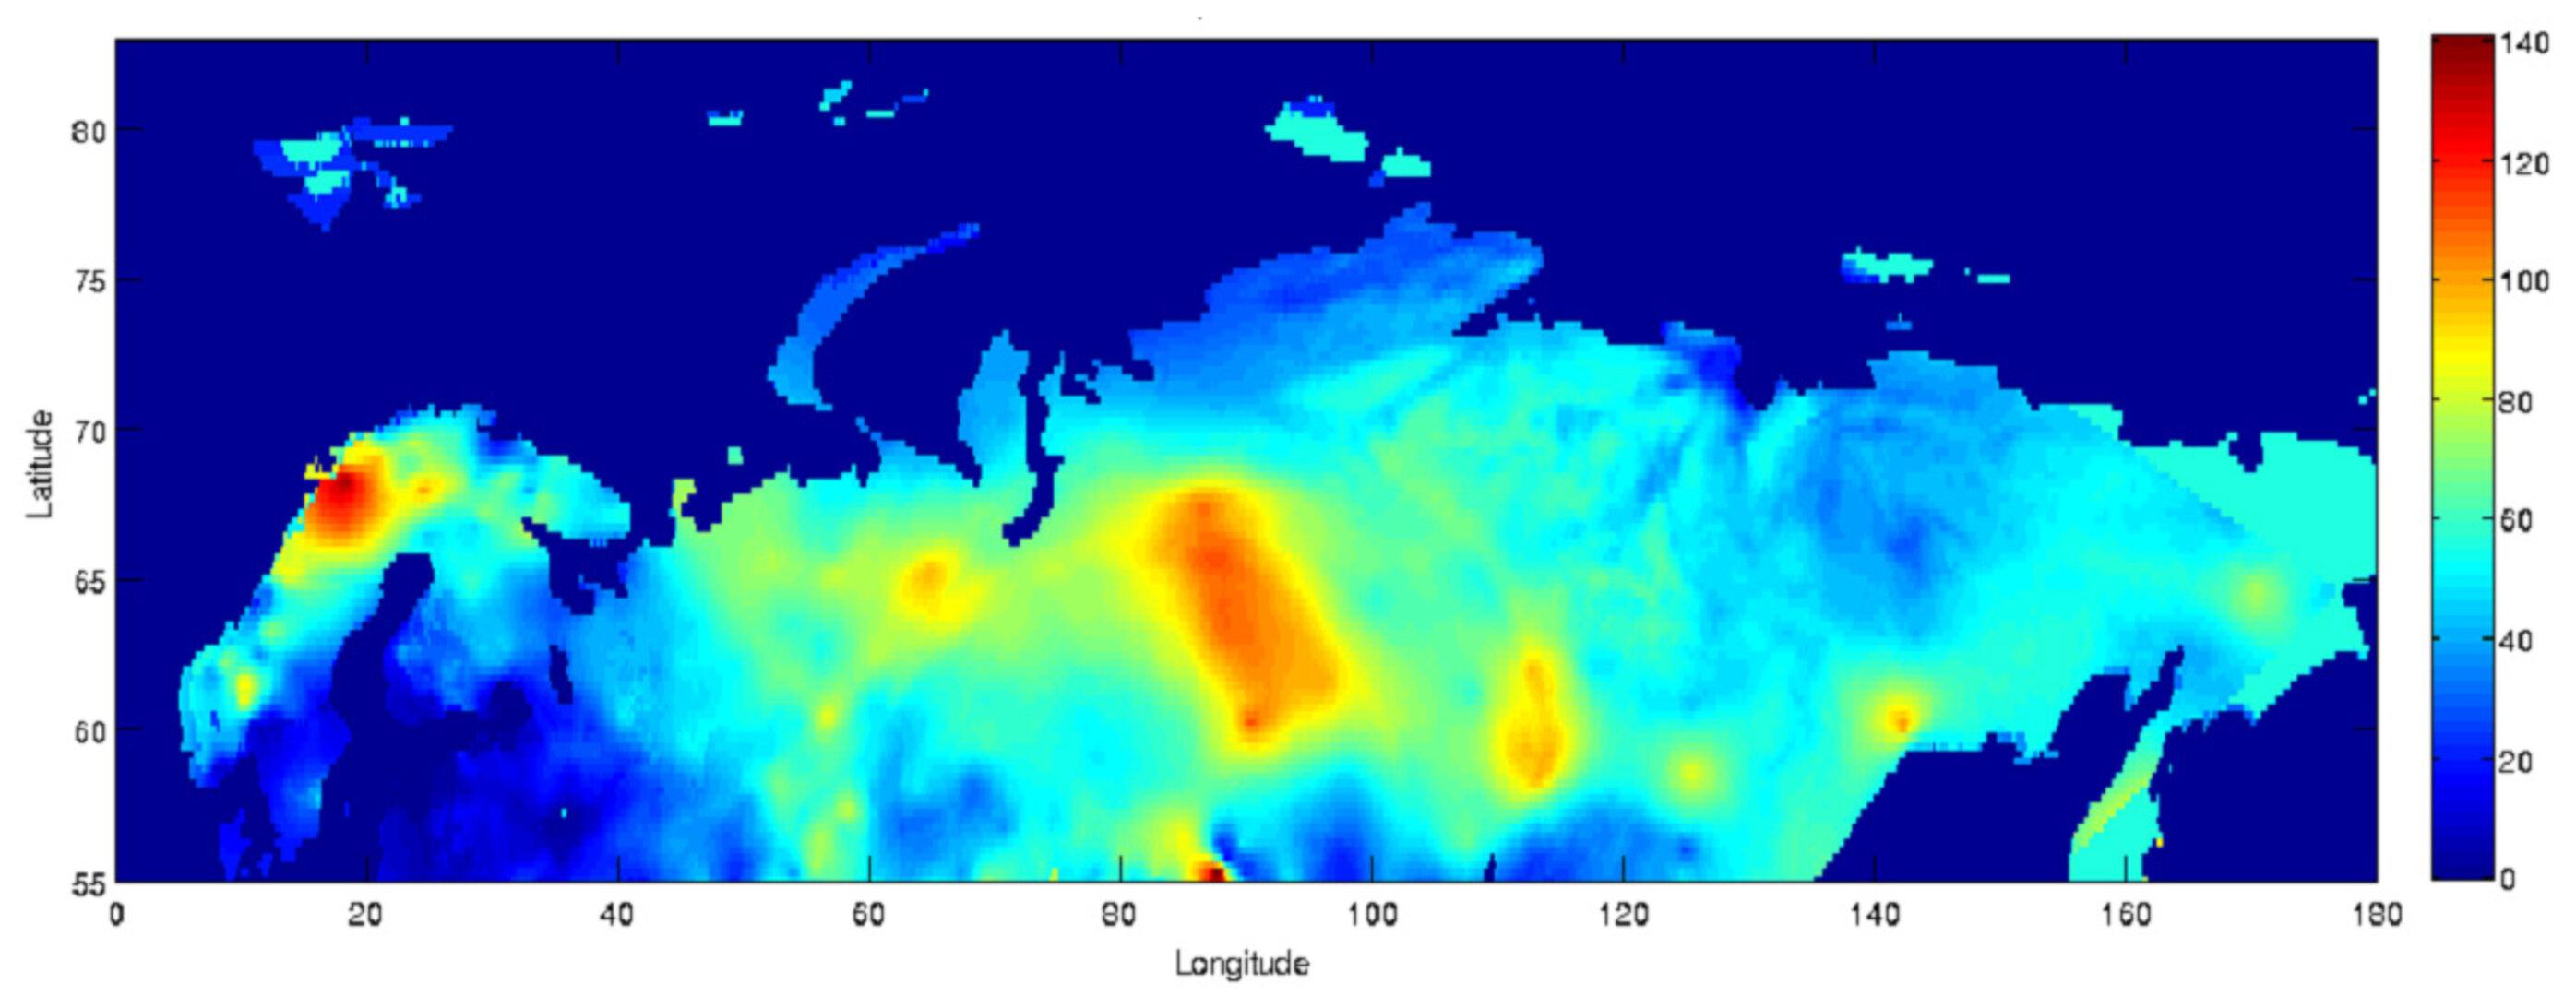 Esa Snow Depth Map Of Eurasia